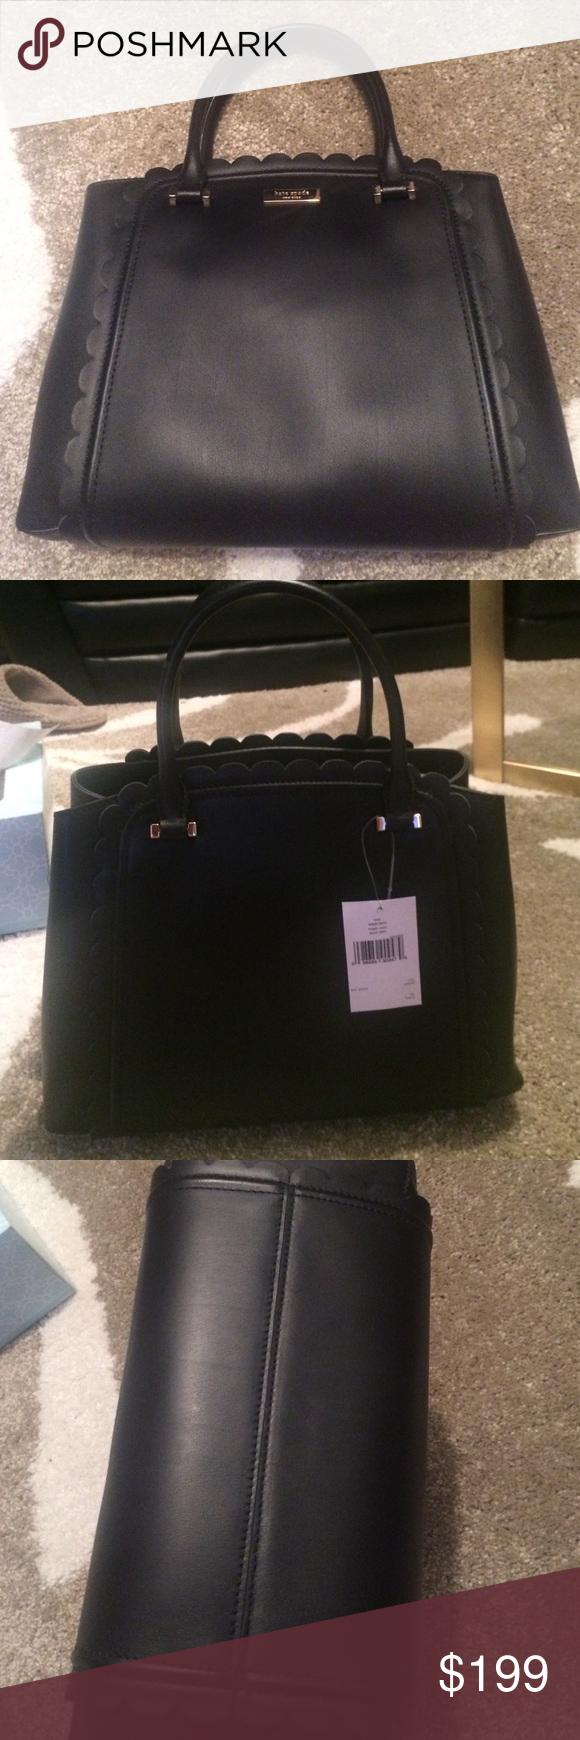 Kat Spade Linzi Maple Court Satchel Brand new! Smooth black leather. Includes shoulder strap. kate spade Bags Satchels